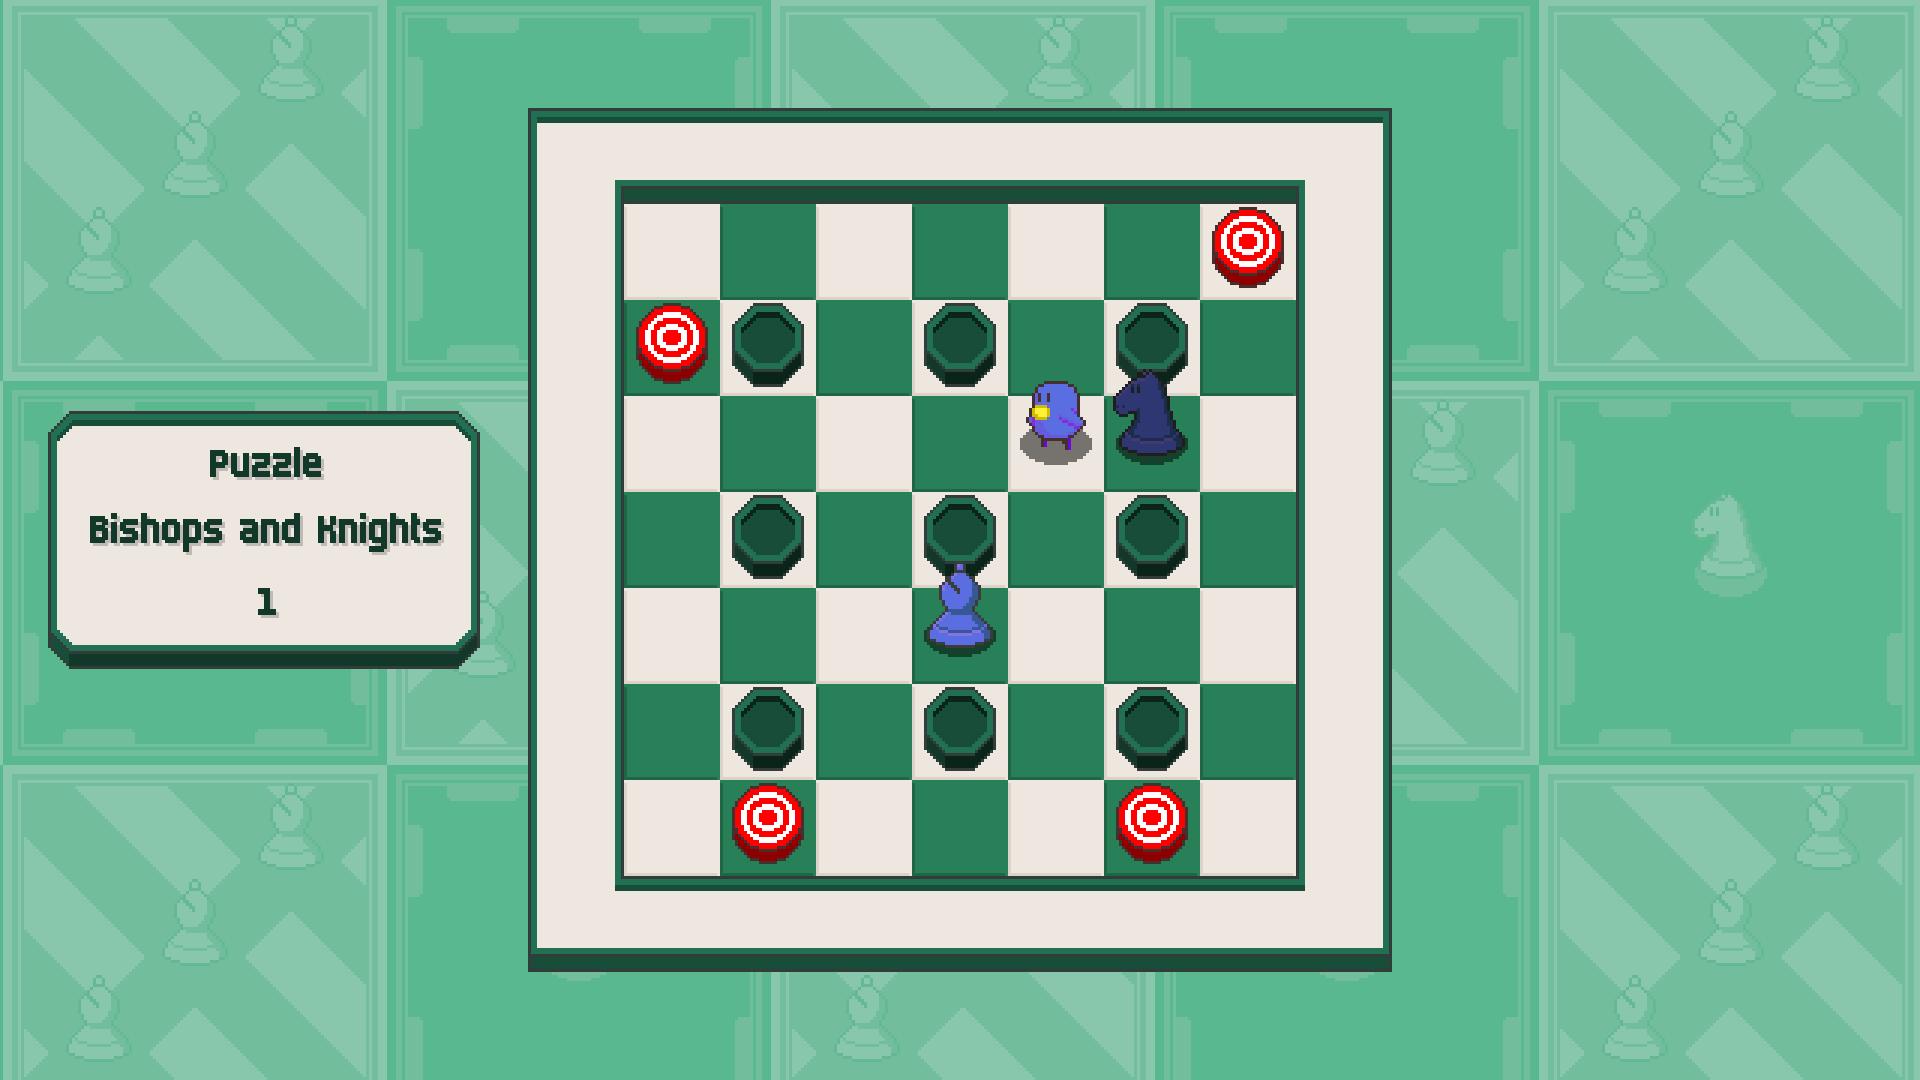 Chessplosion - Puzzle Solution Guide + Achievements Walkthrough - Grandblaster: Bishops and Knights - E427221